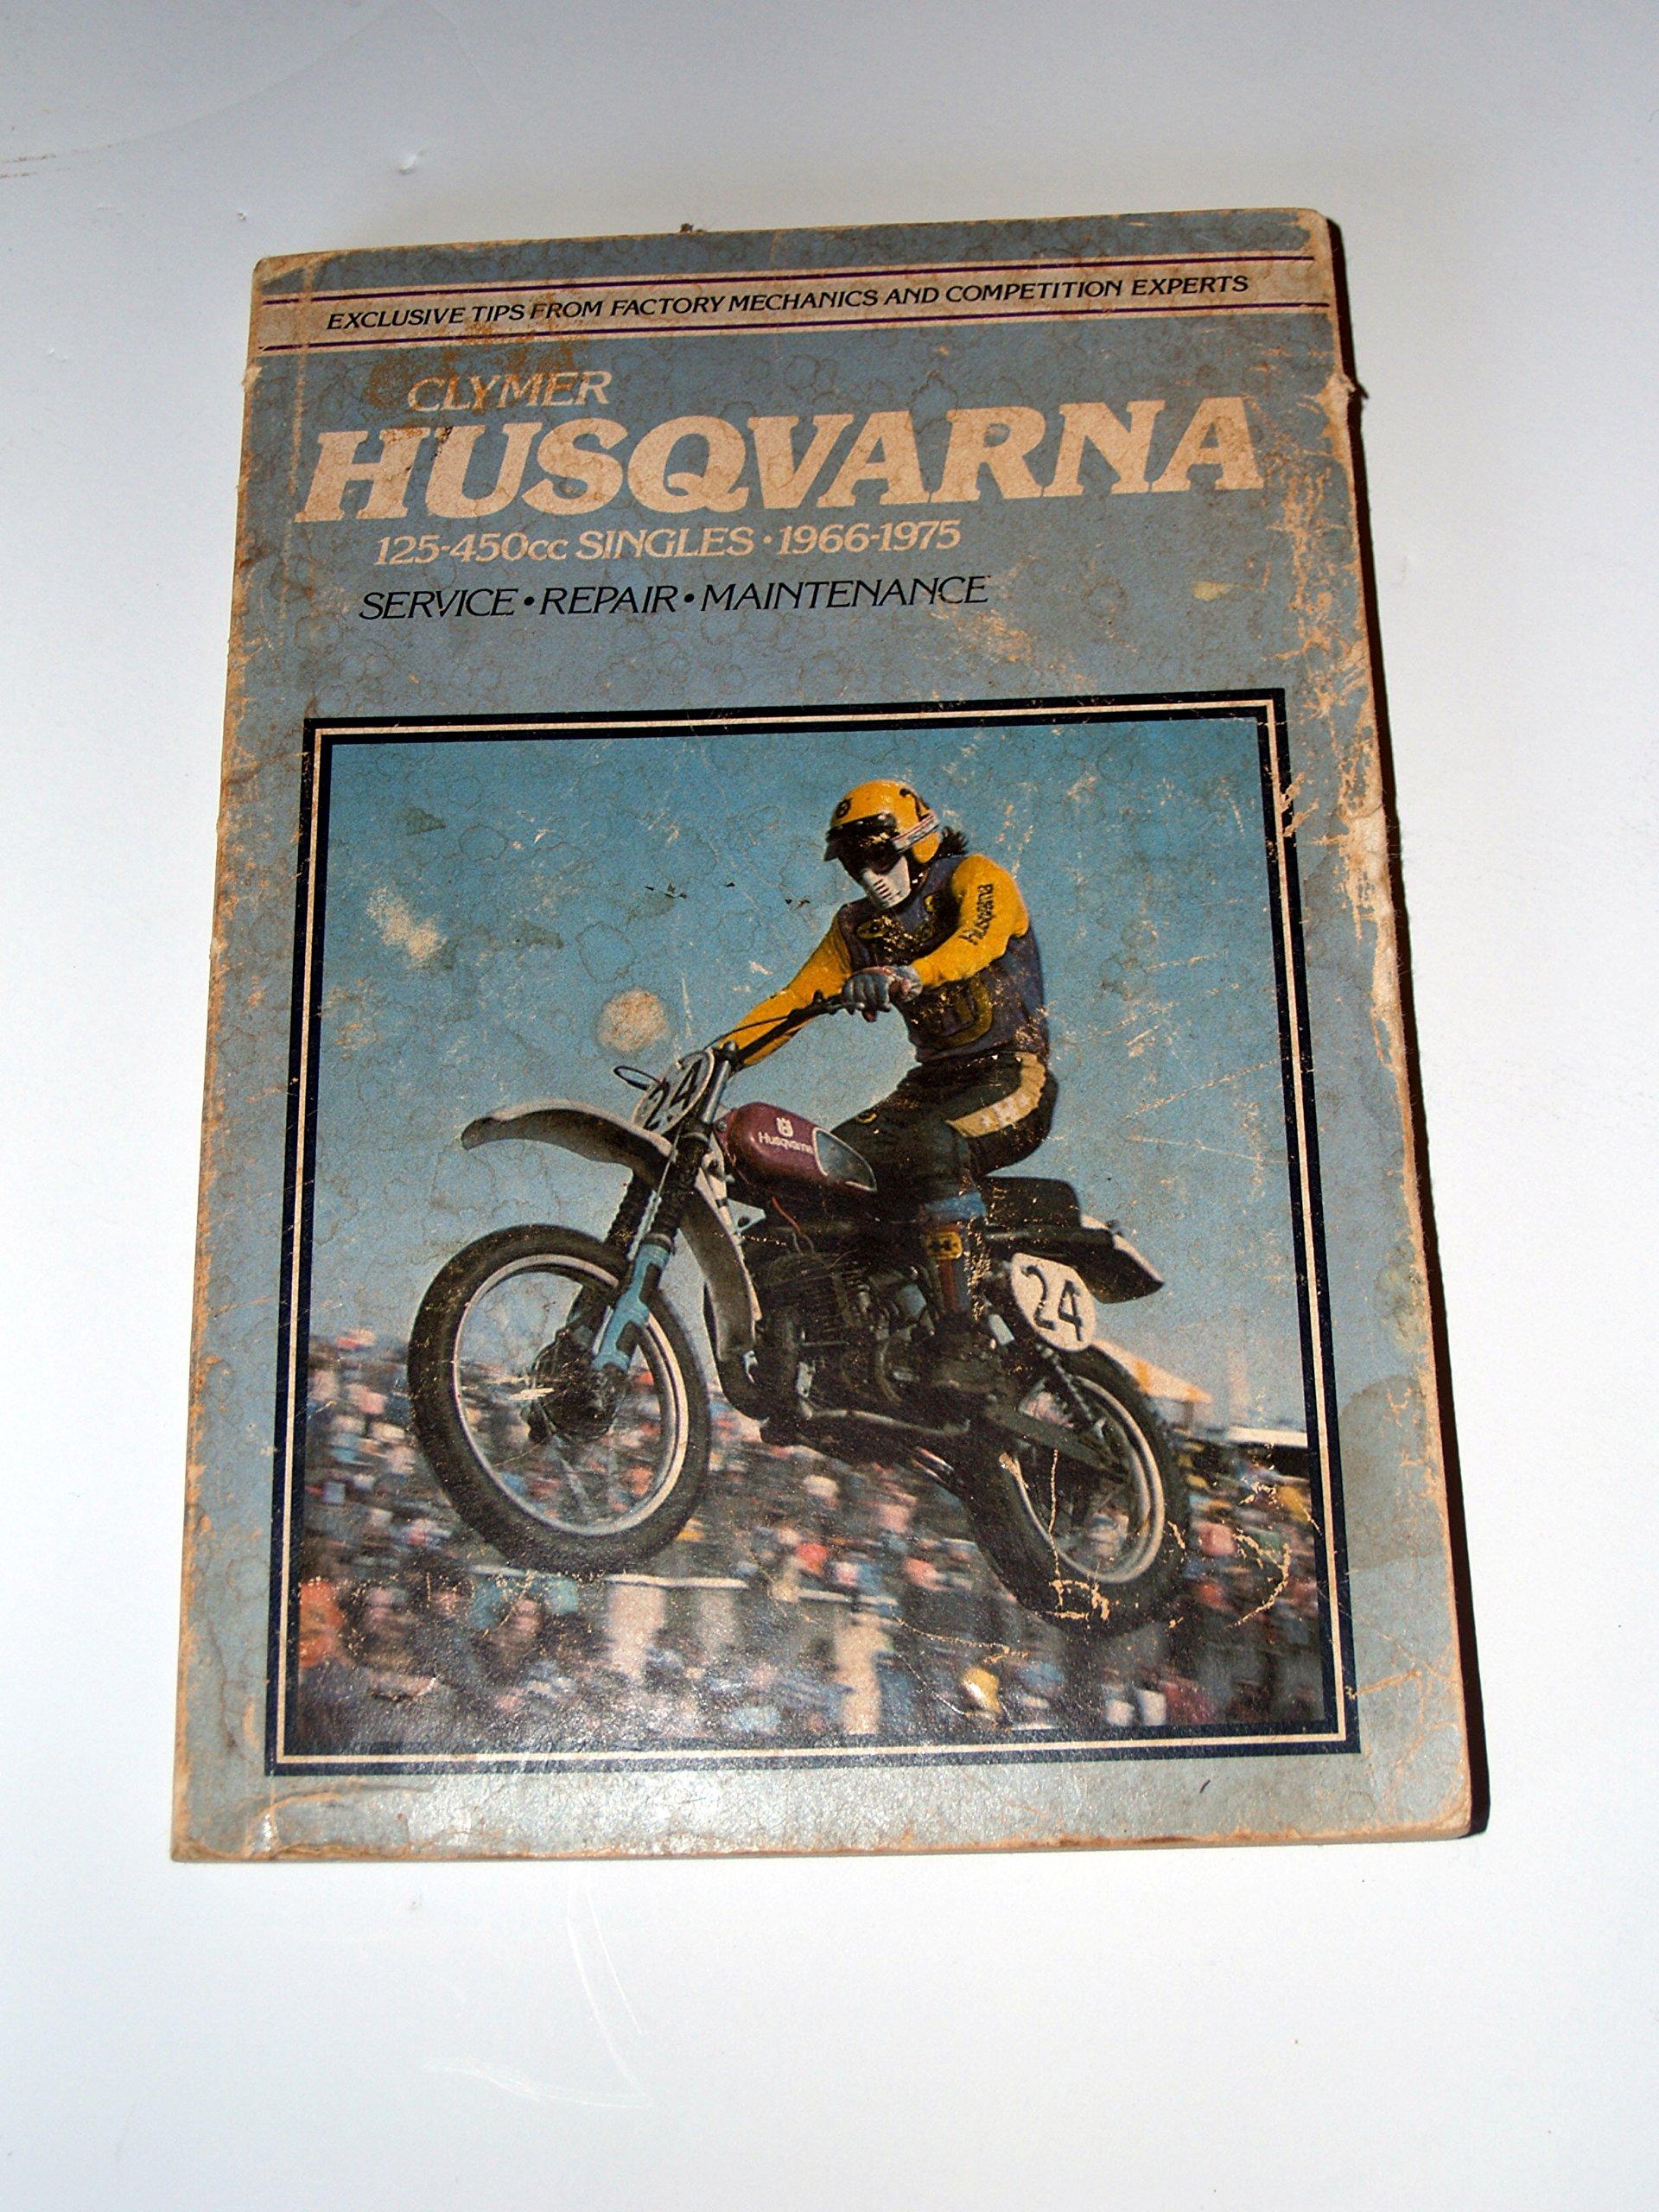 Clymer Husqvarna 125-450 CC Singles 1966-1975 Motorcycle Service Repair  Manual: Clymer: 0739718156326: Amazon.com: Books